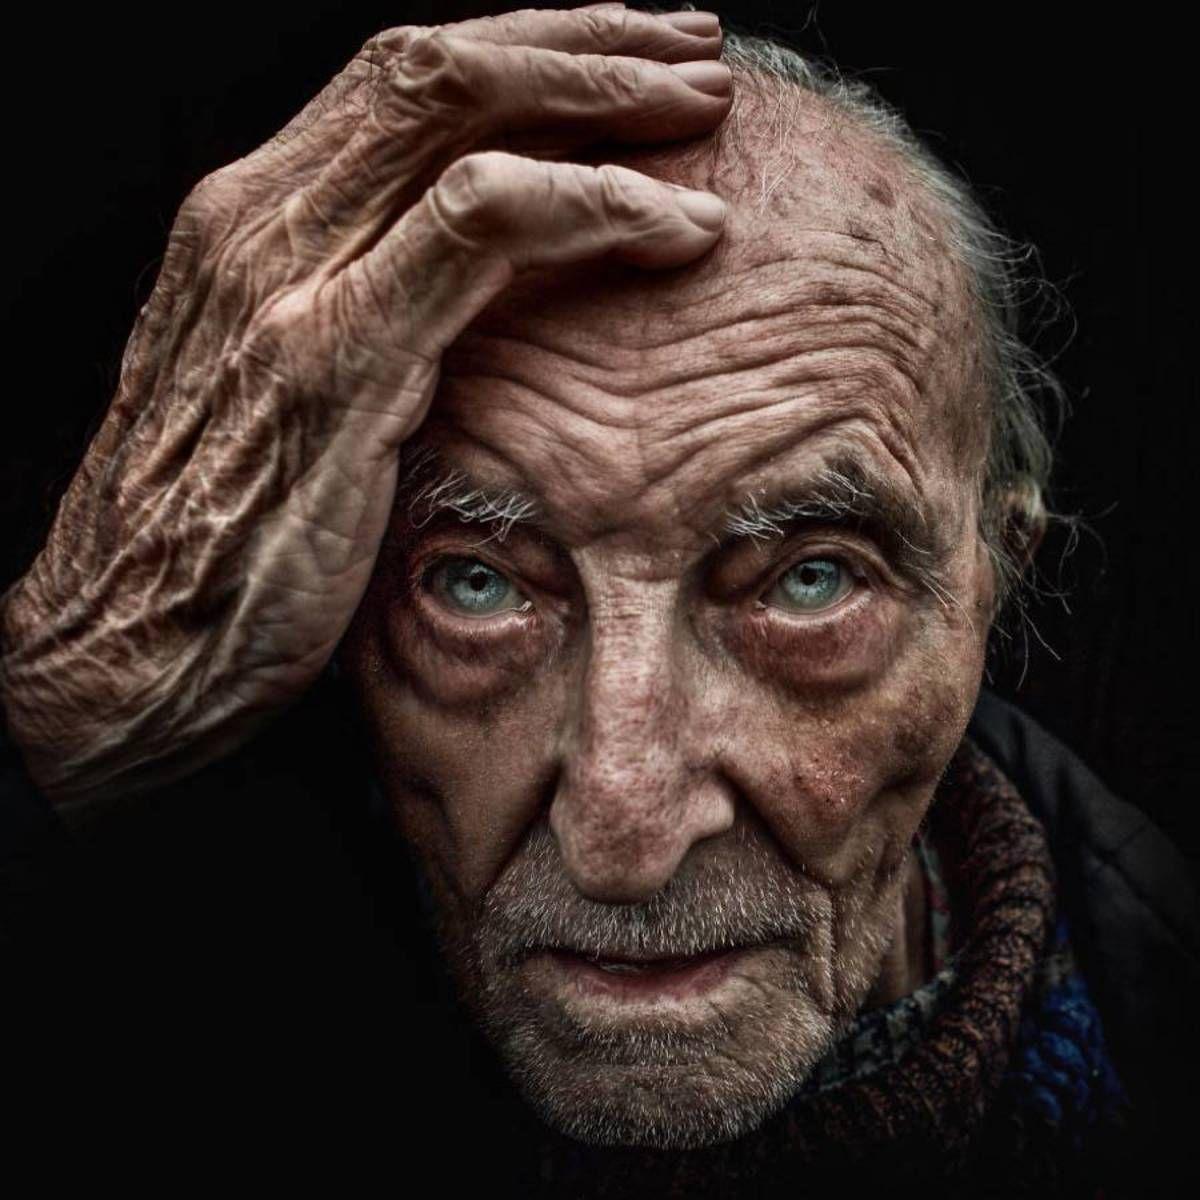 Photographer Lee Jeffries Striking Portraits Will Change: Striking Portraits Of Homeless People By Lee Jeffries